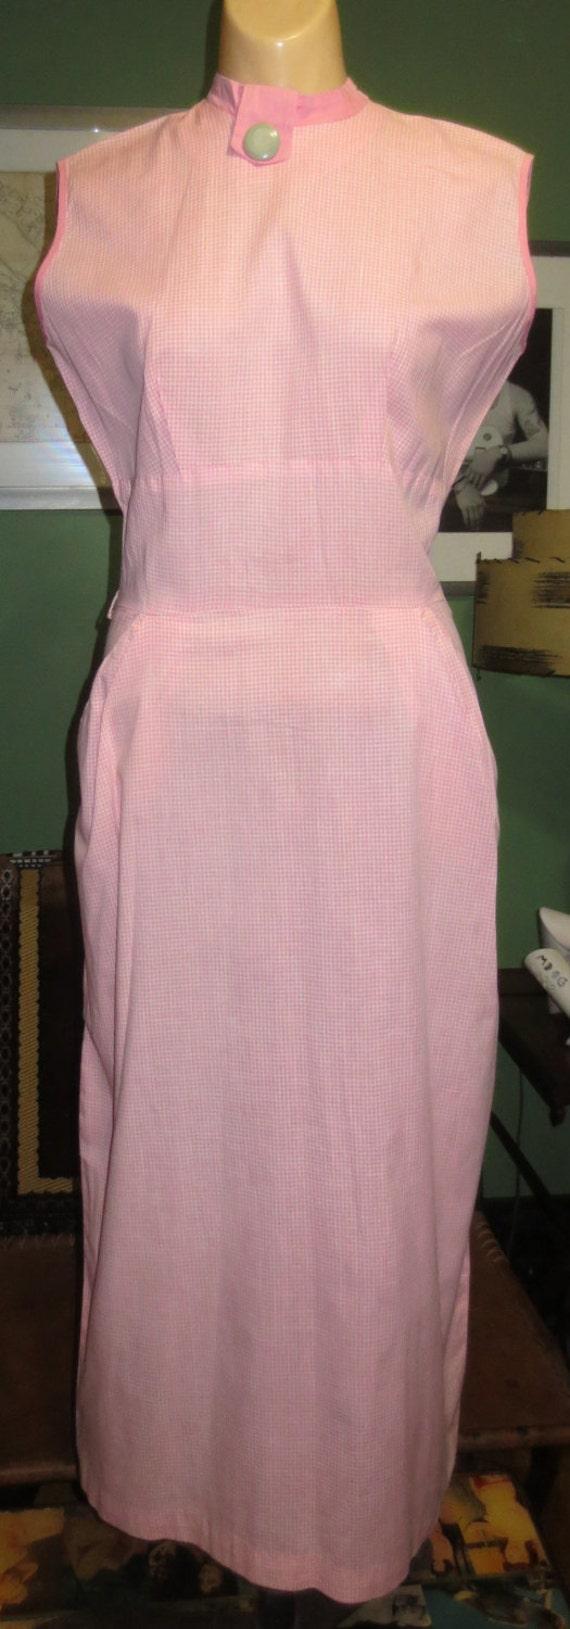 Medium 26 Waist 1950s Vintage Pink Gingham Slim Co